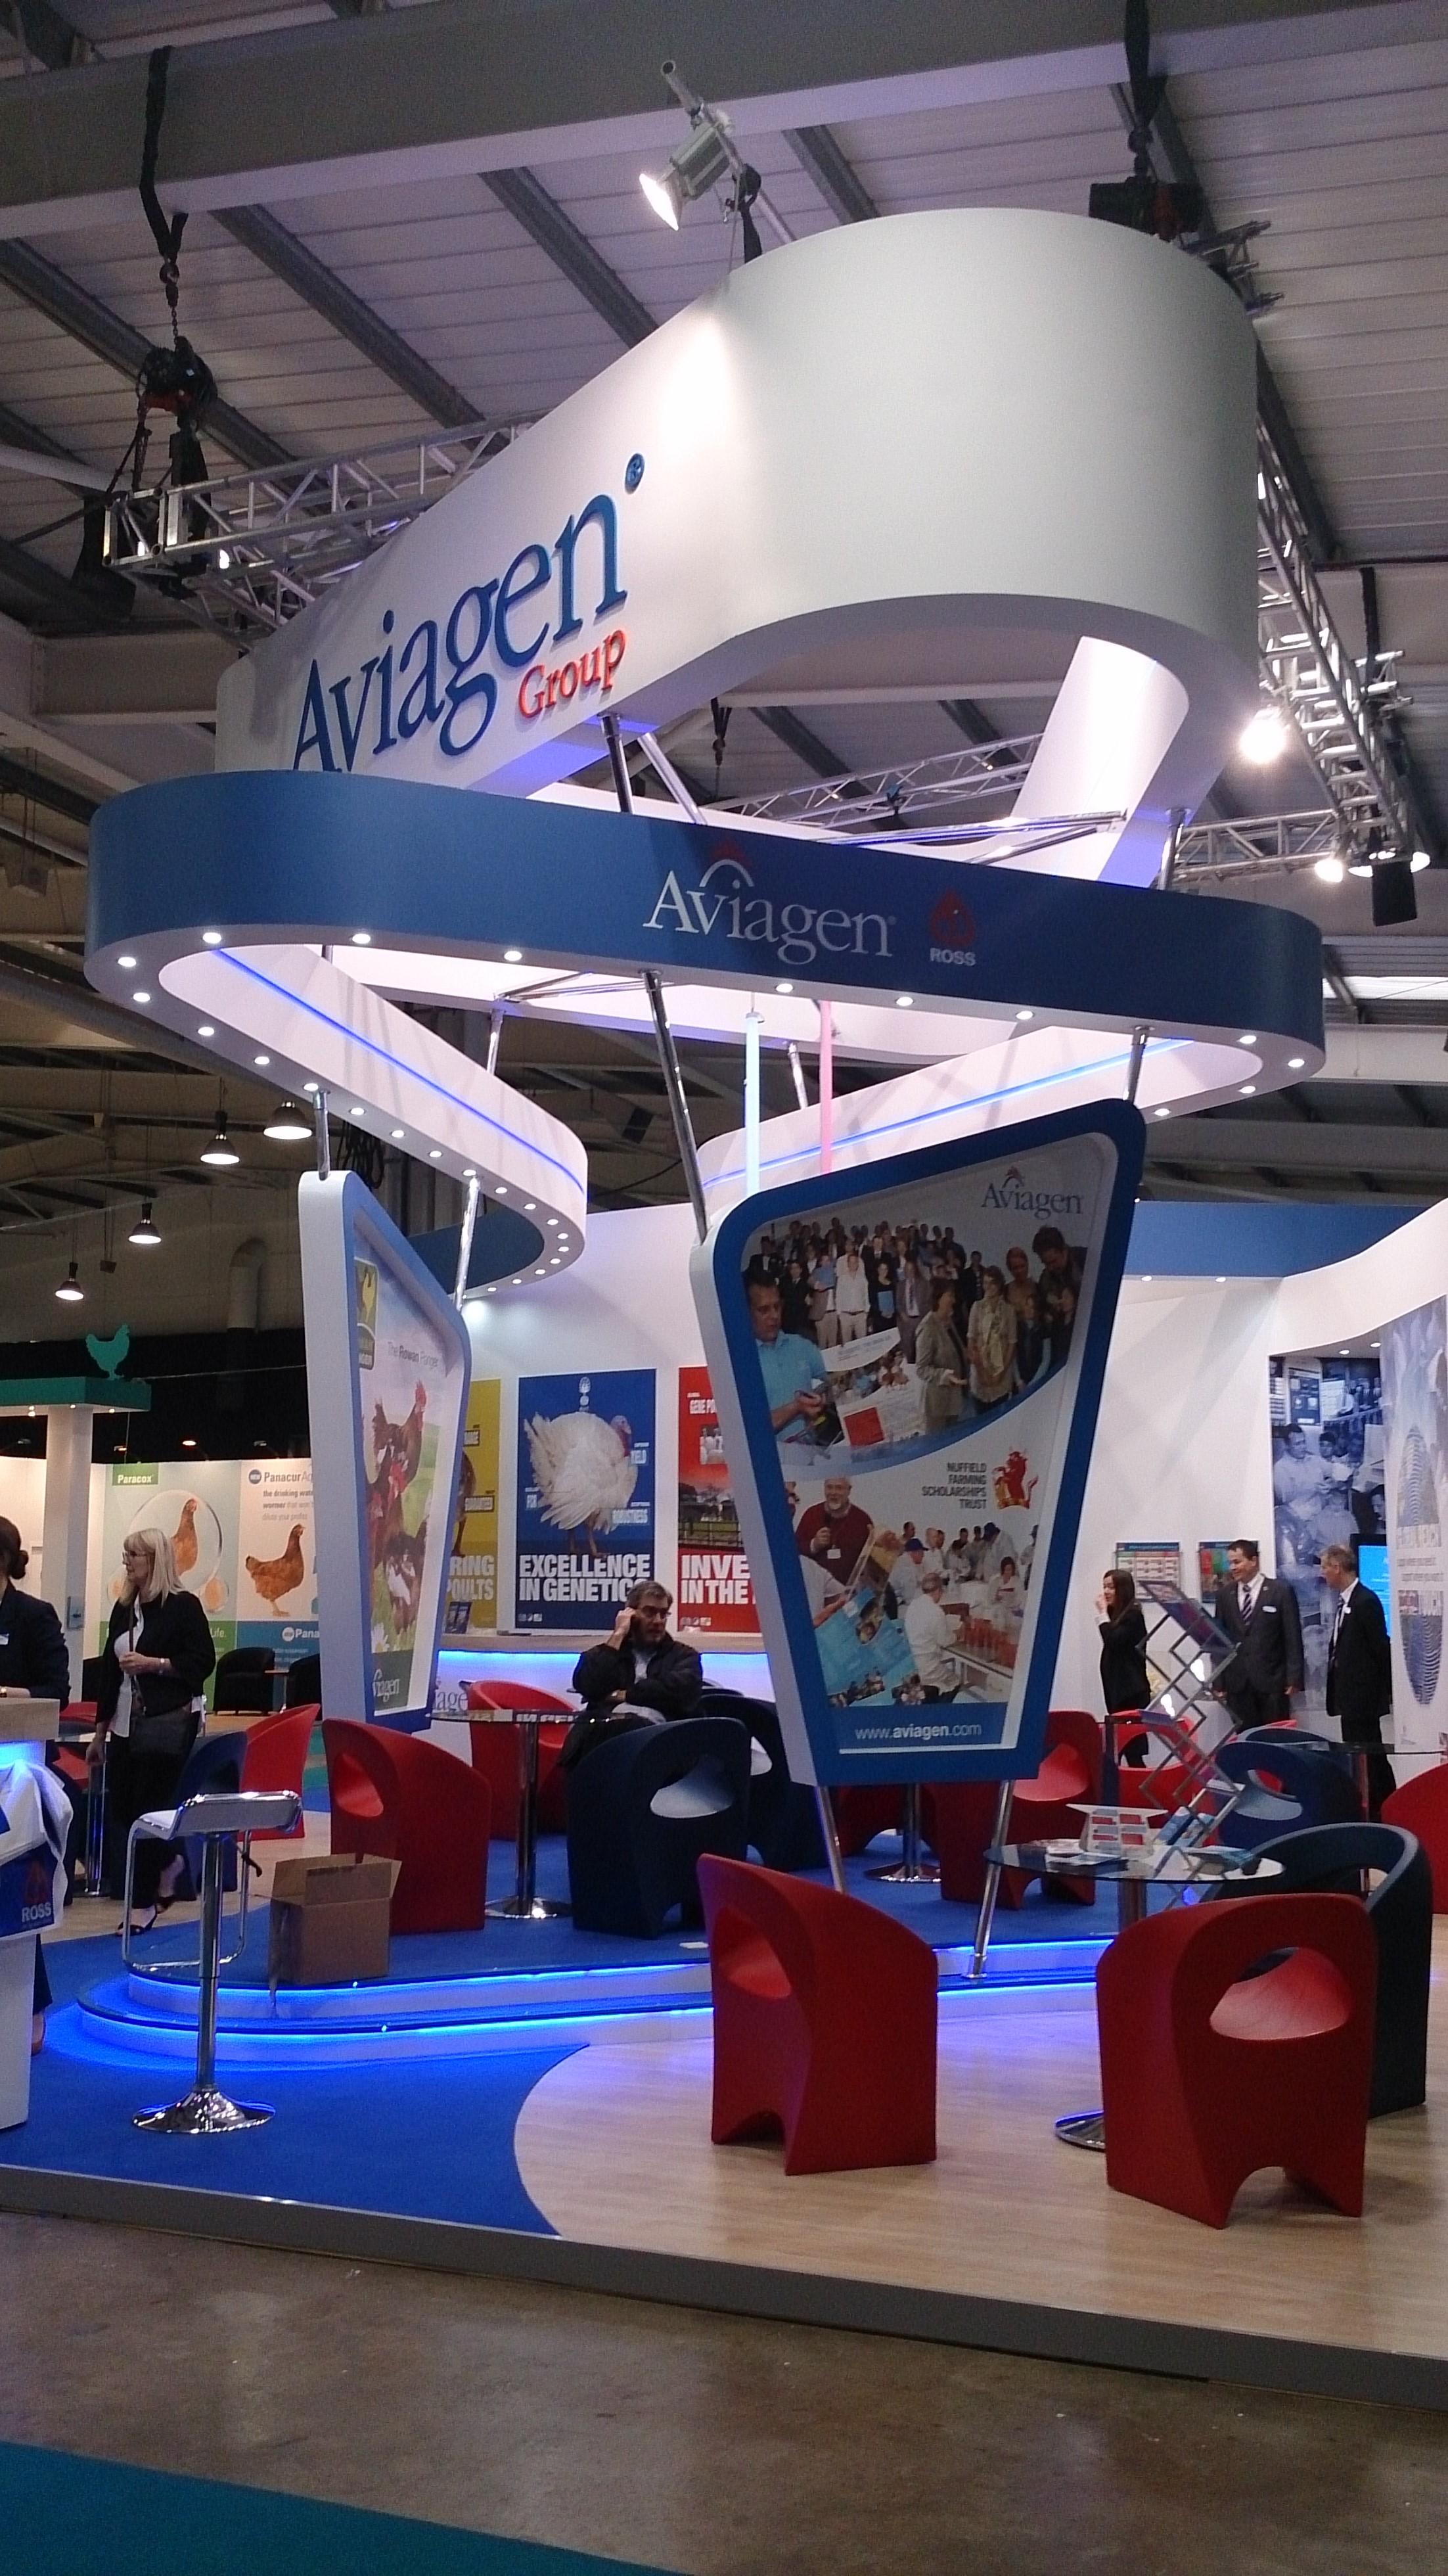 Aviagen-exhibition-stand-meeting-area